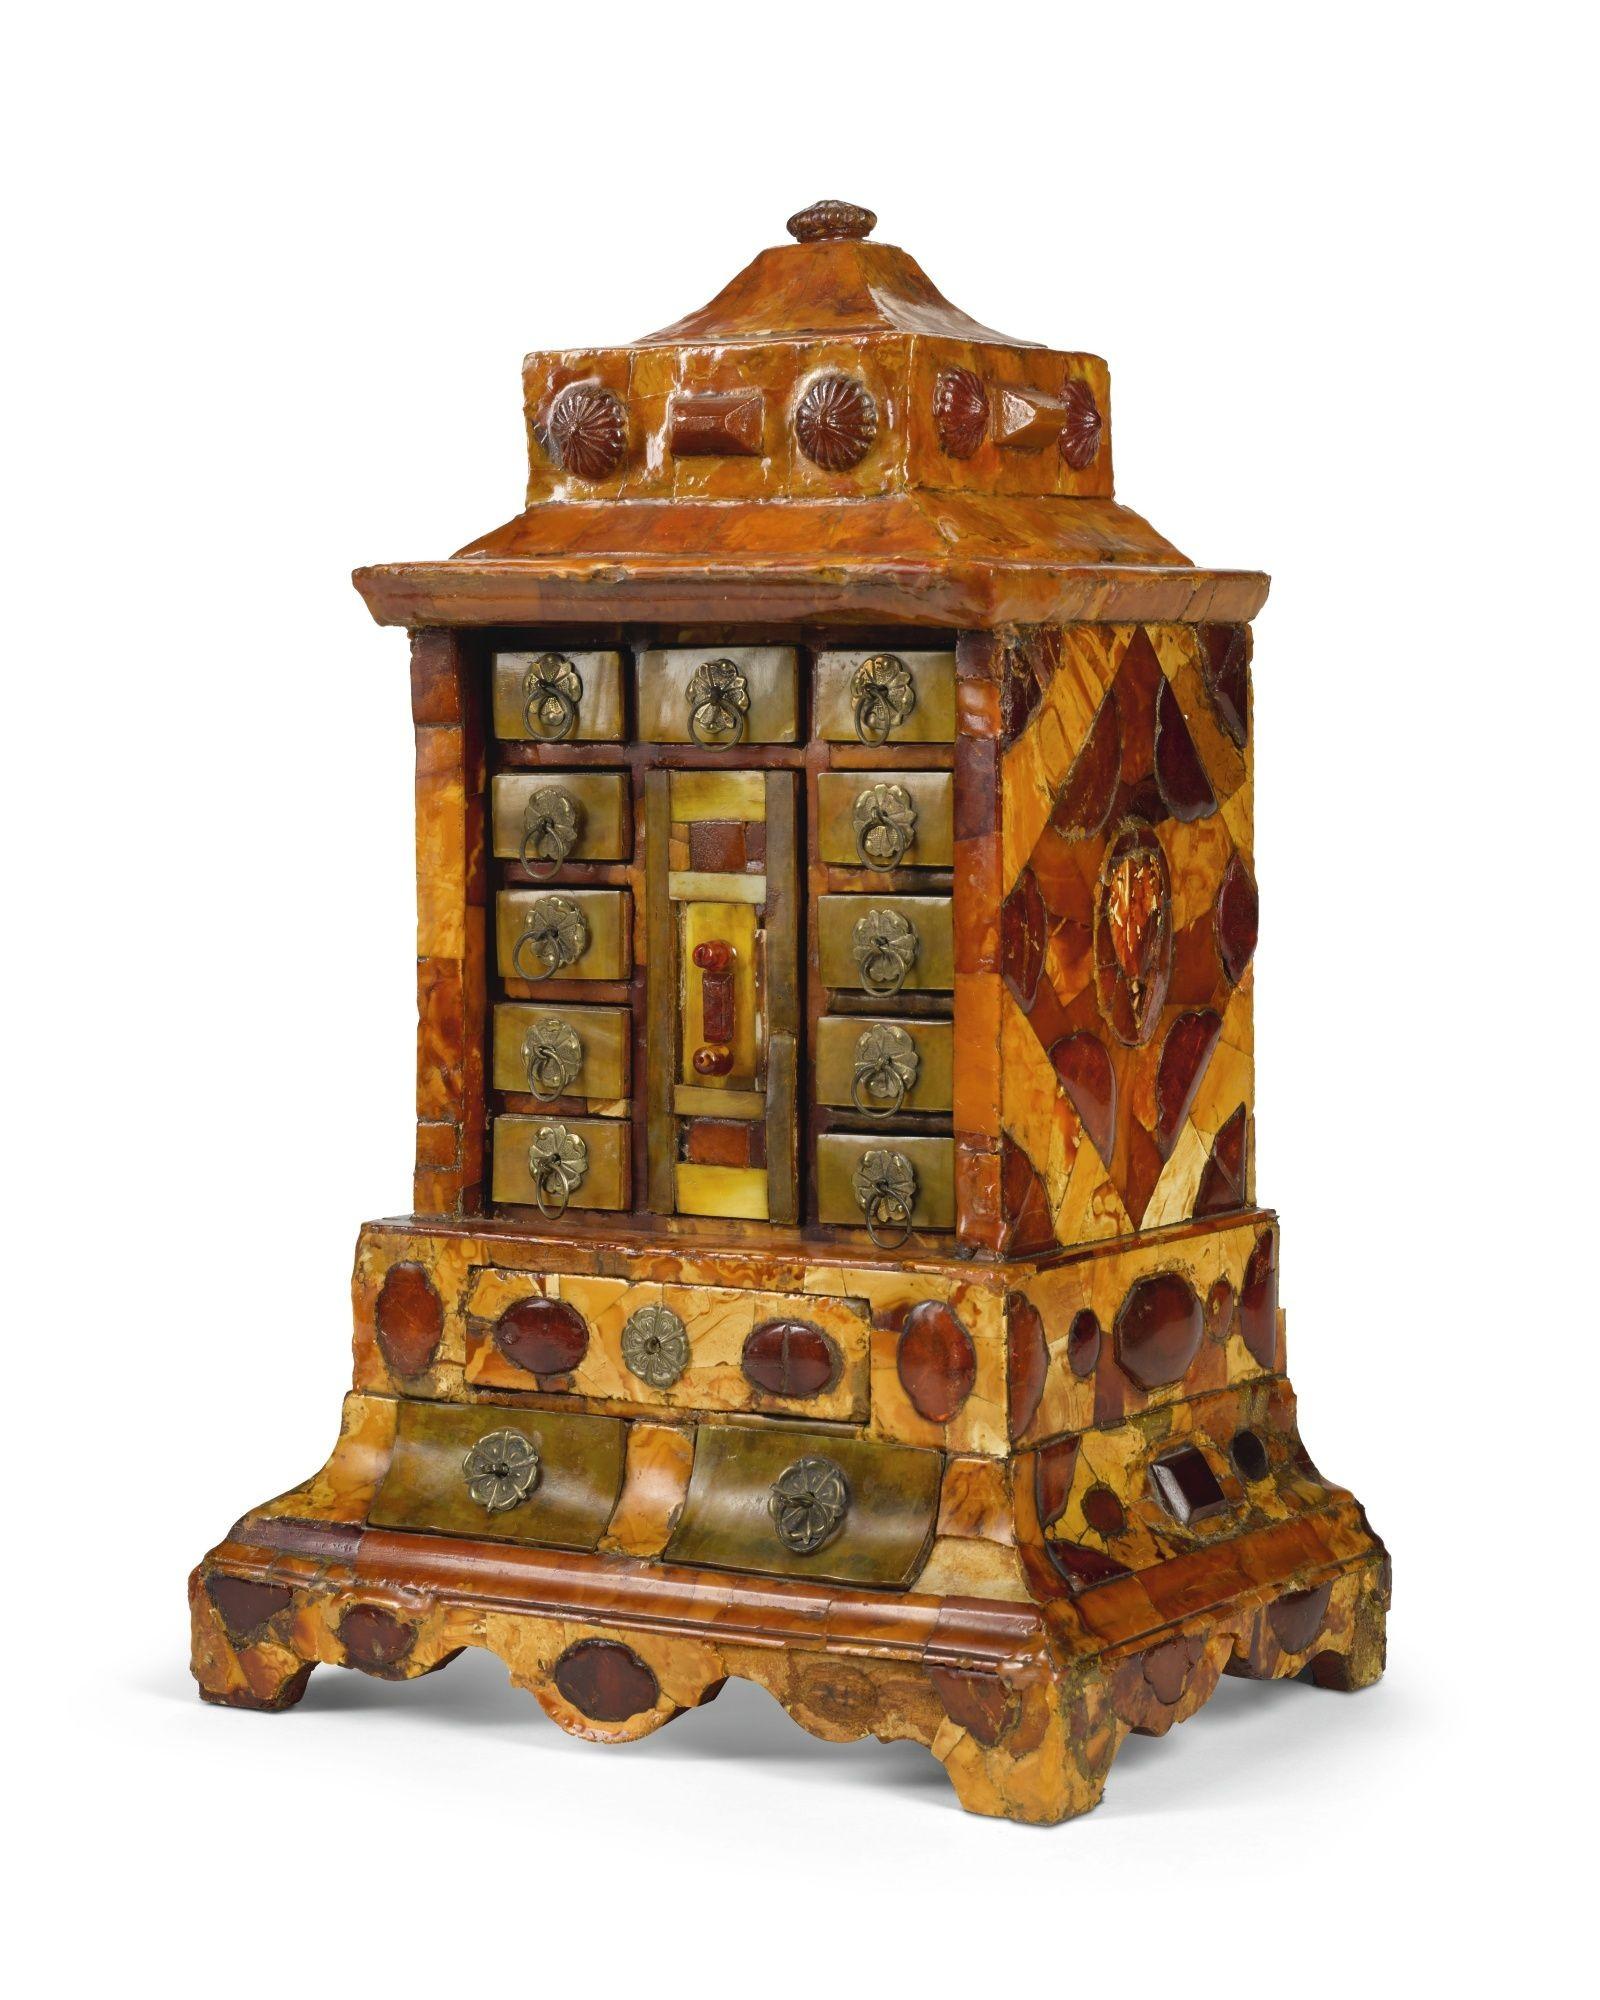 Imprimir Calendário Setembro 2017 Actual northern German Probably Danzig Late 17th Century Table Cabinet